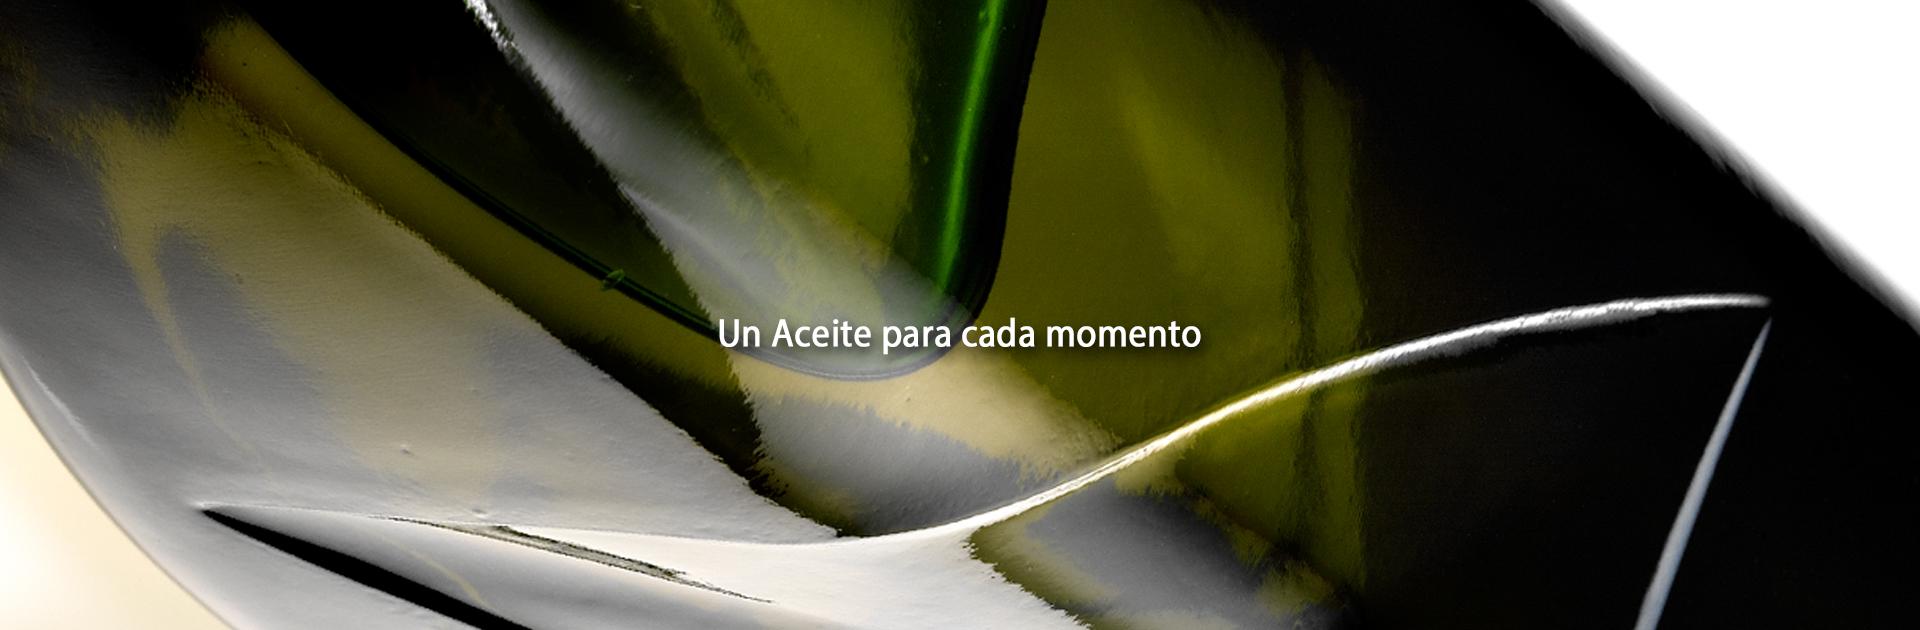 banner-inicio-esp